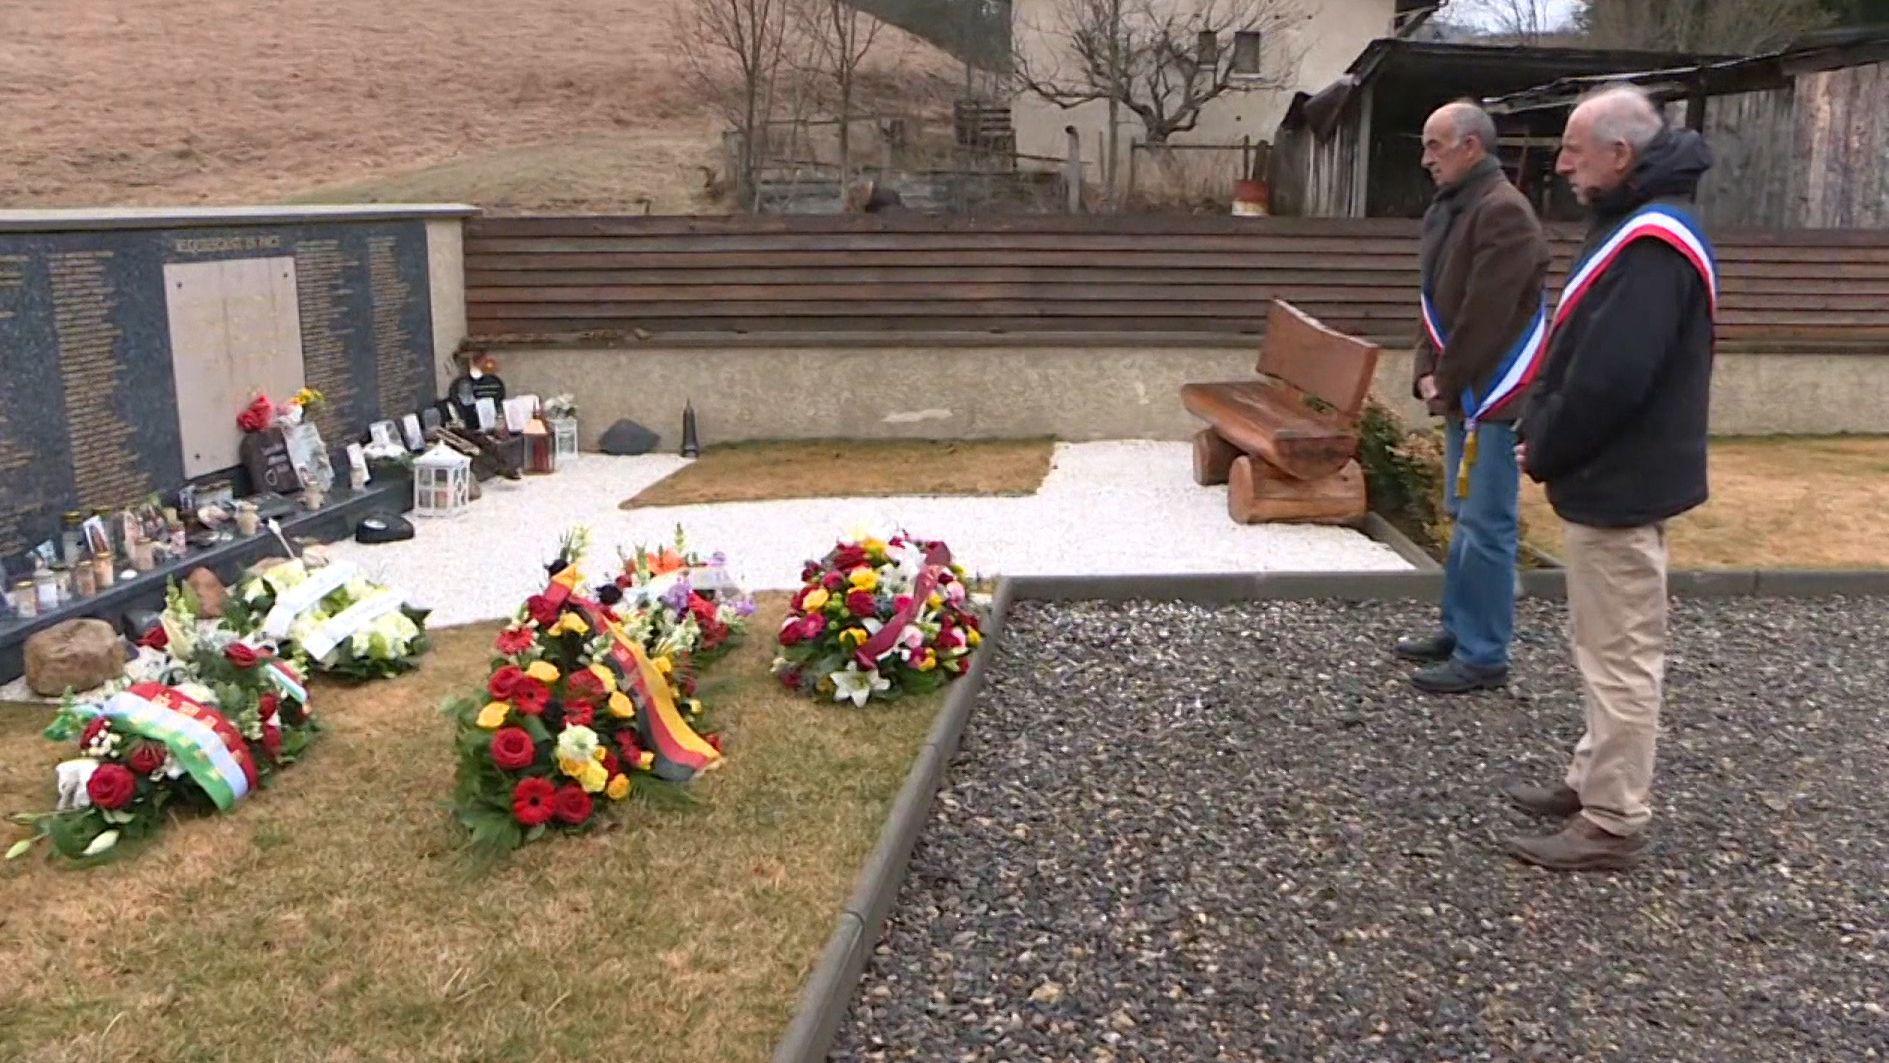 Stilles Gedenken an Germanwings-Absturz